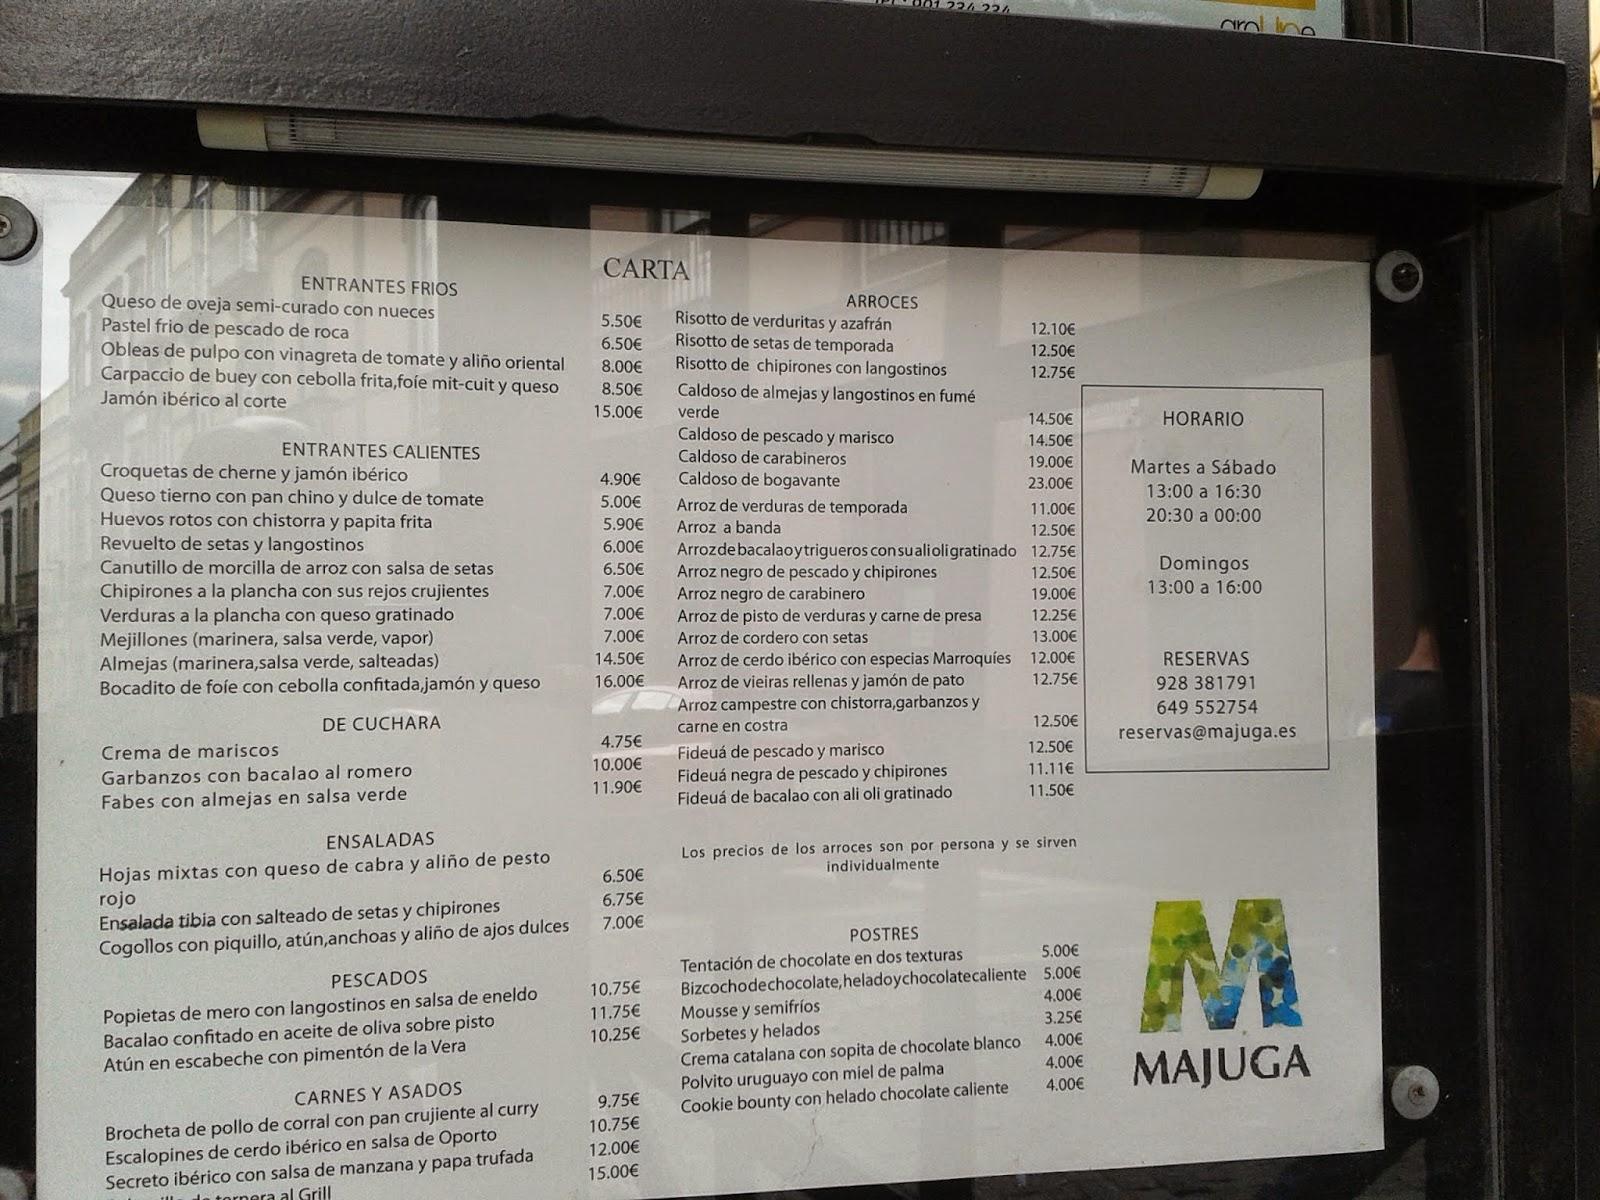 Majuga restaurant review, Las Palmas de Gran Canaria